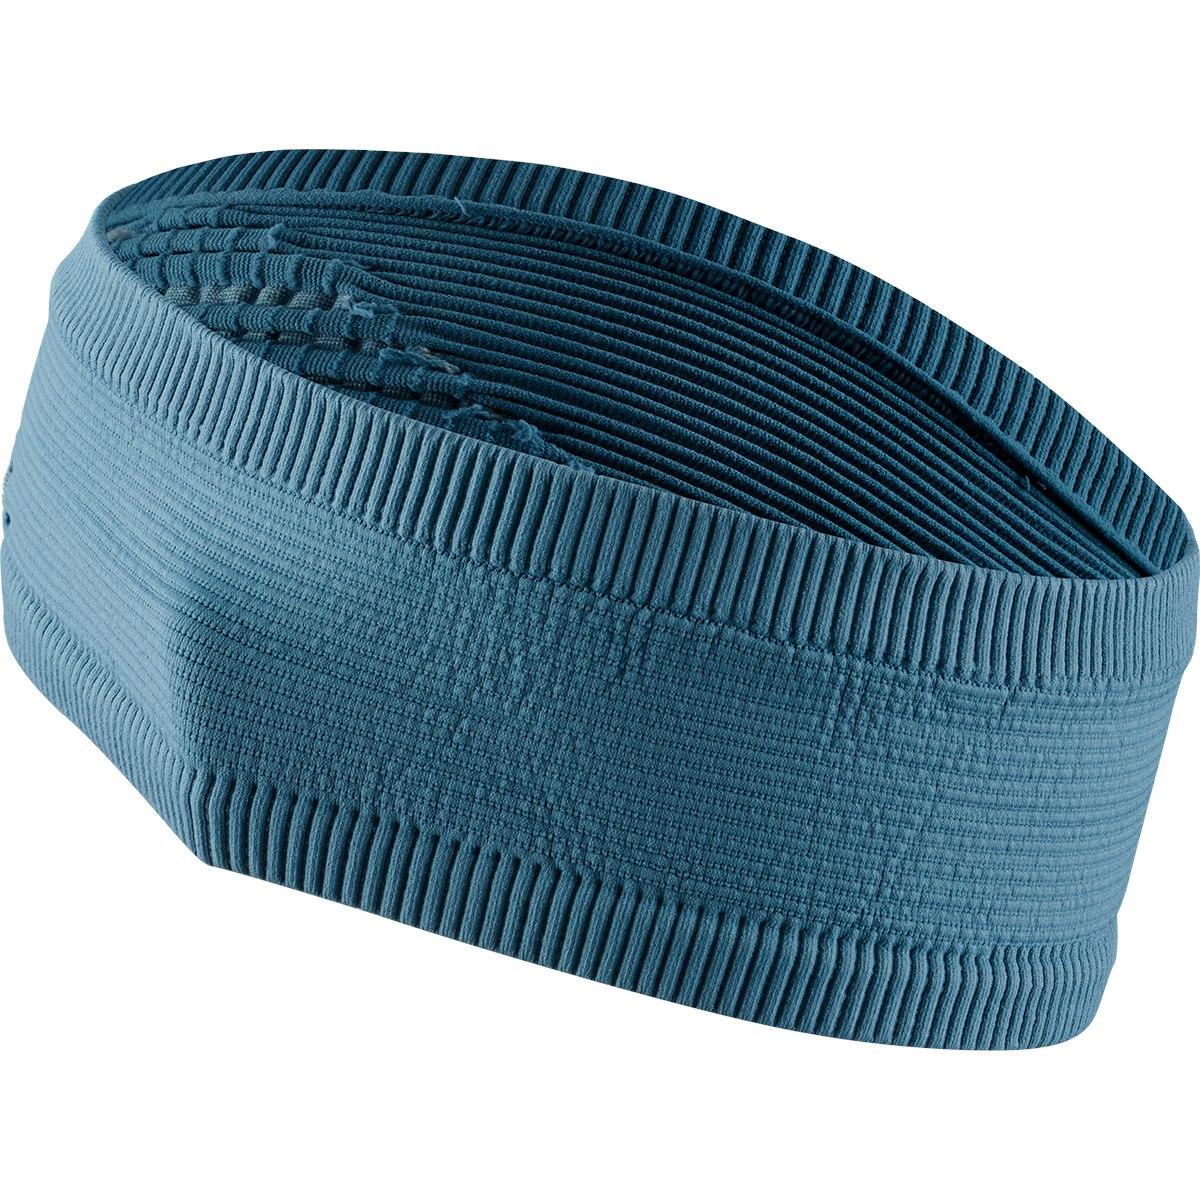 Bild von X-Bionic Headband 4.0 - bluestone/dolomite grey